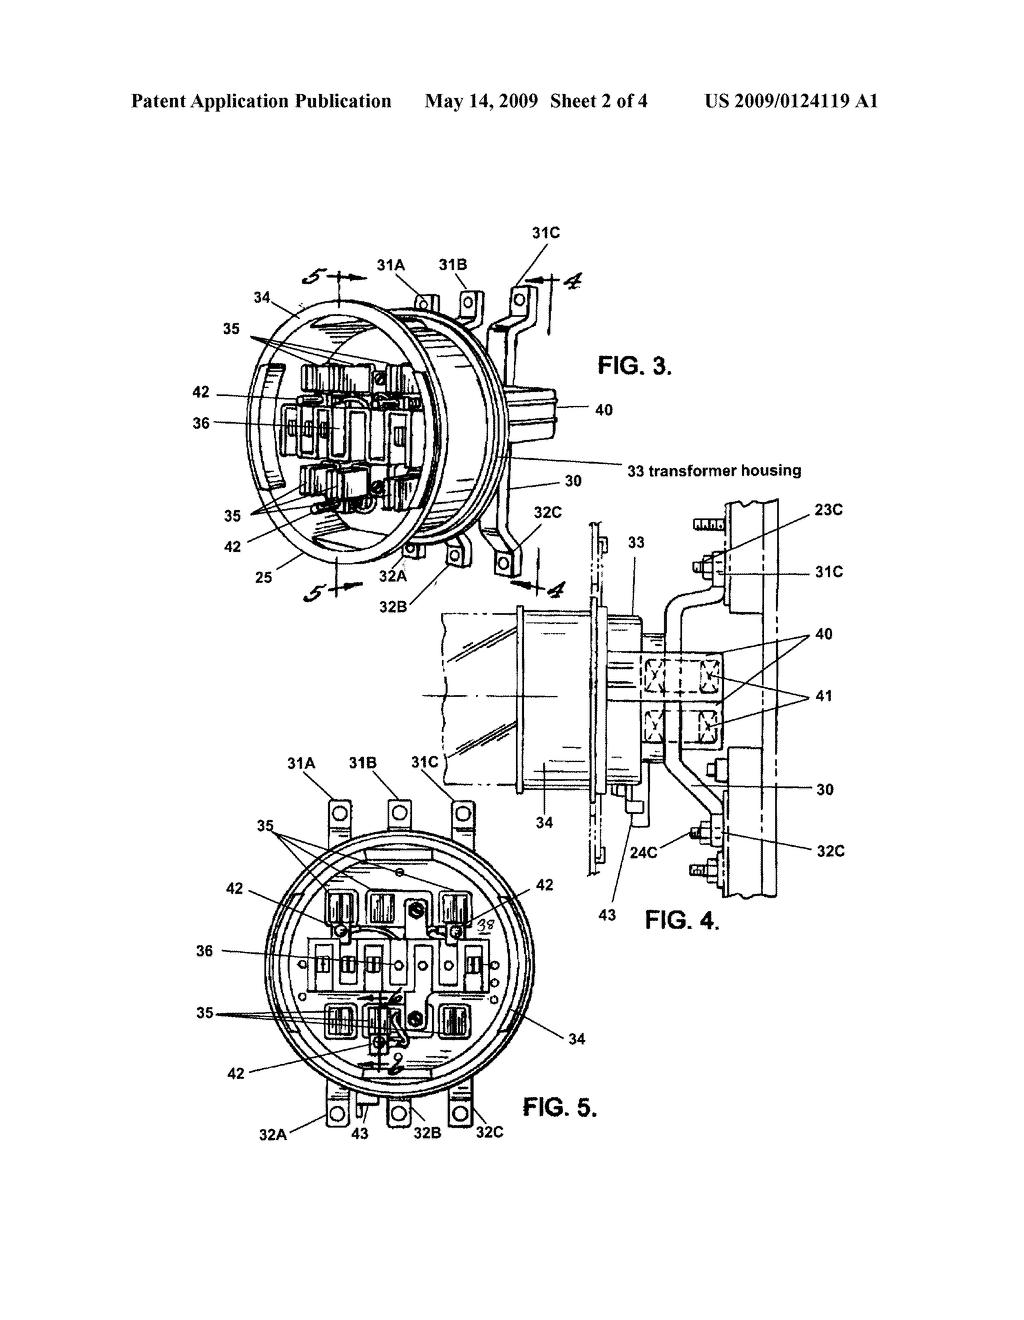 Diagrams#571800: Meter Base Wiring Diagram